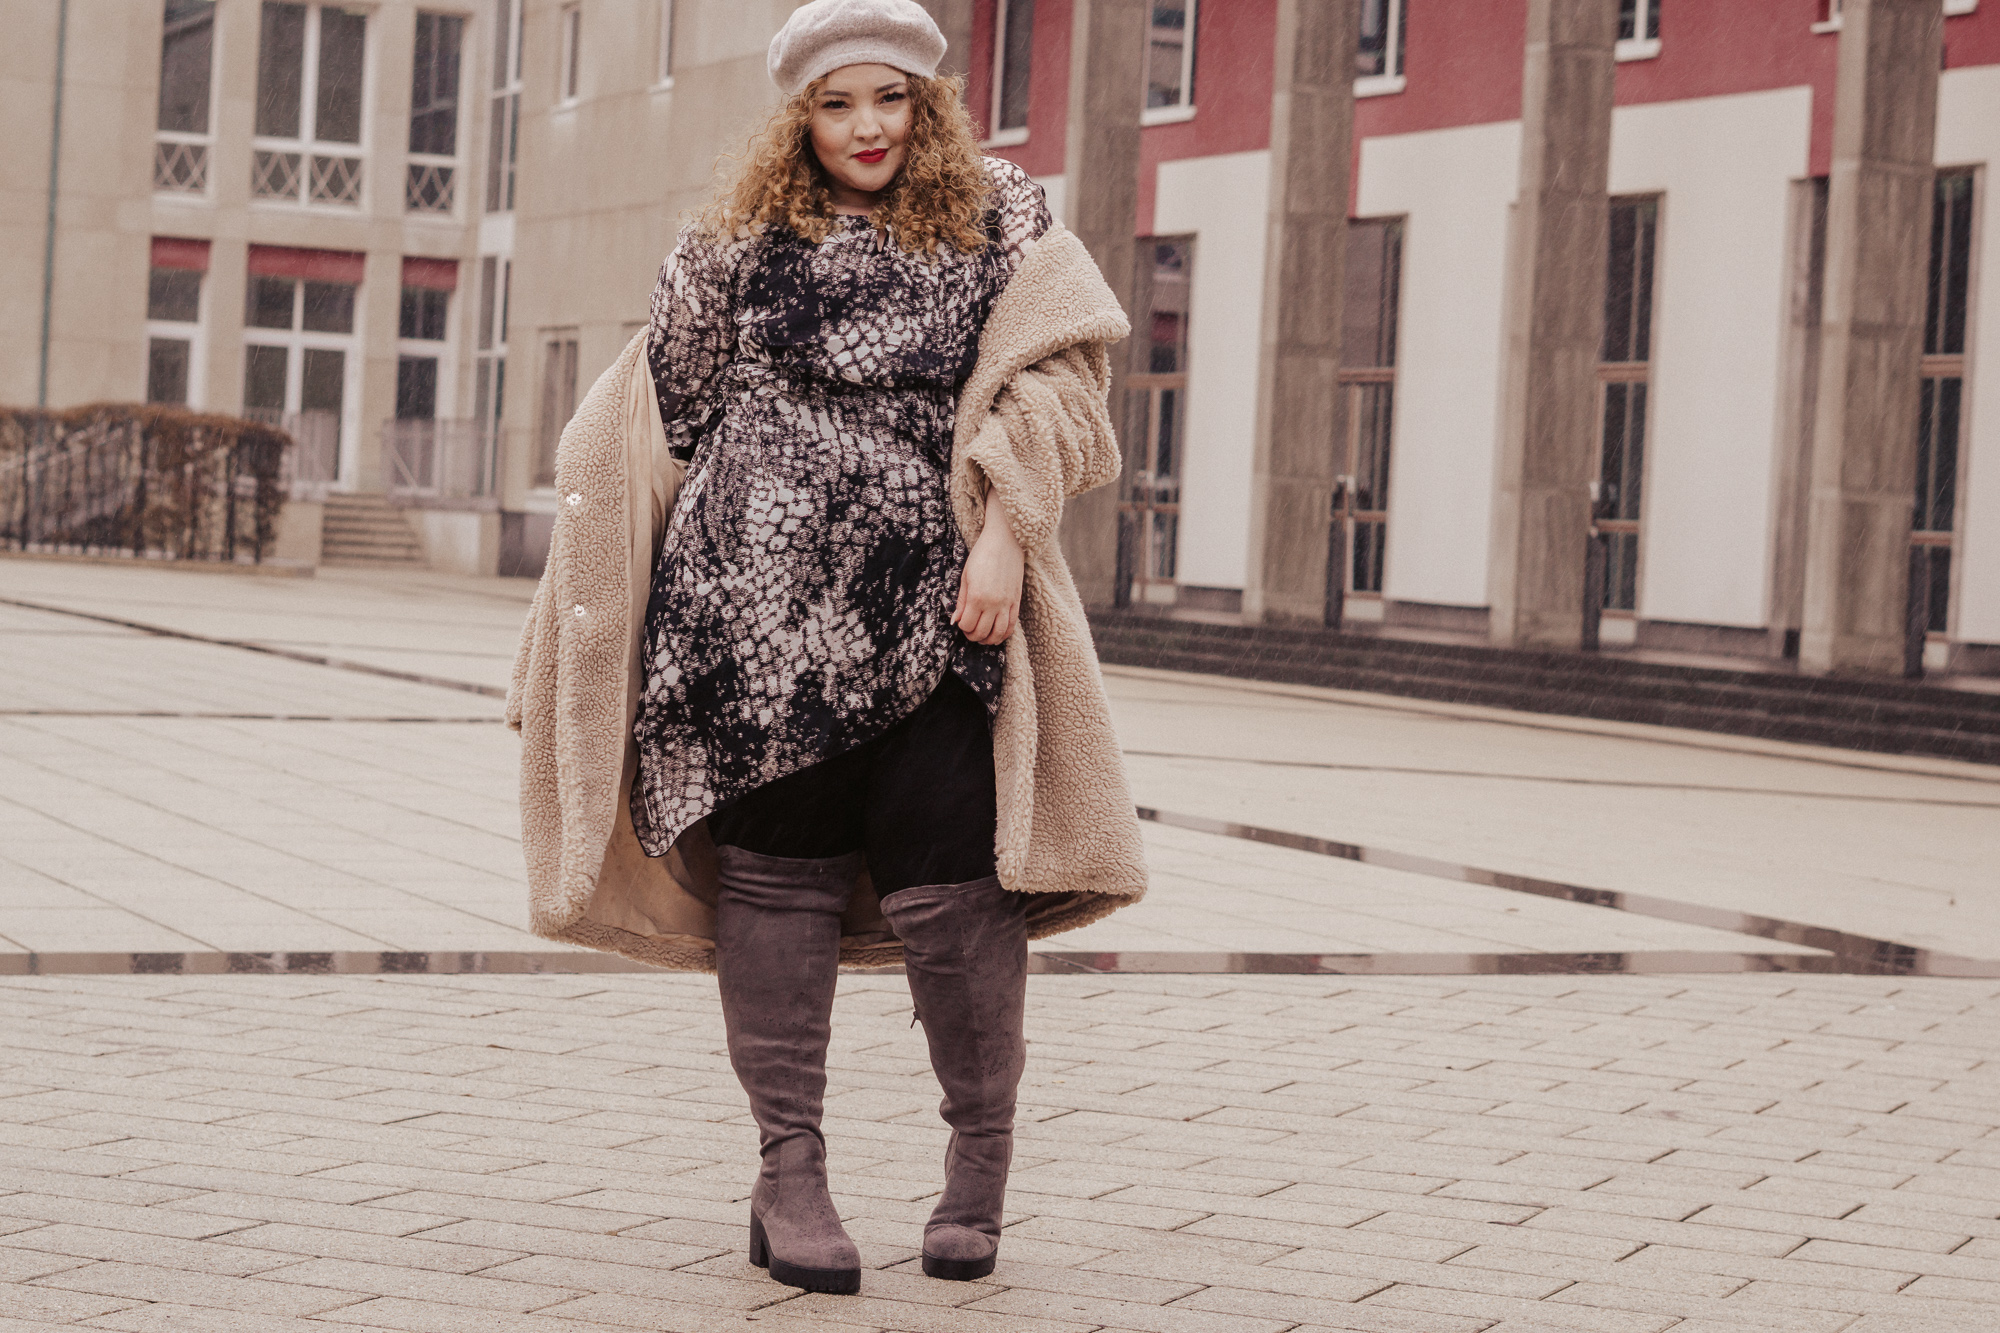 abendlook_ausgeh_outfit_kurvige_frauen_fashion_plussize_infatstyle_blogger_mia